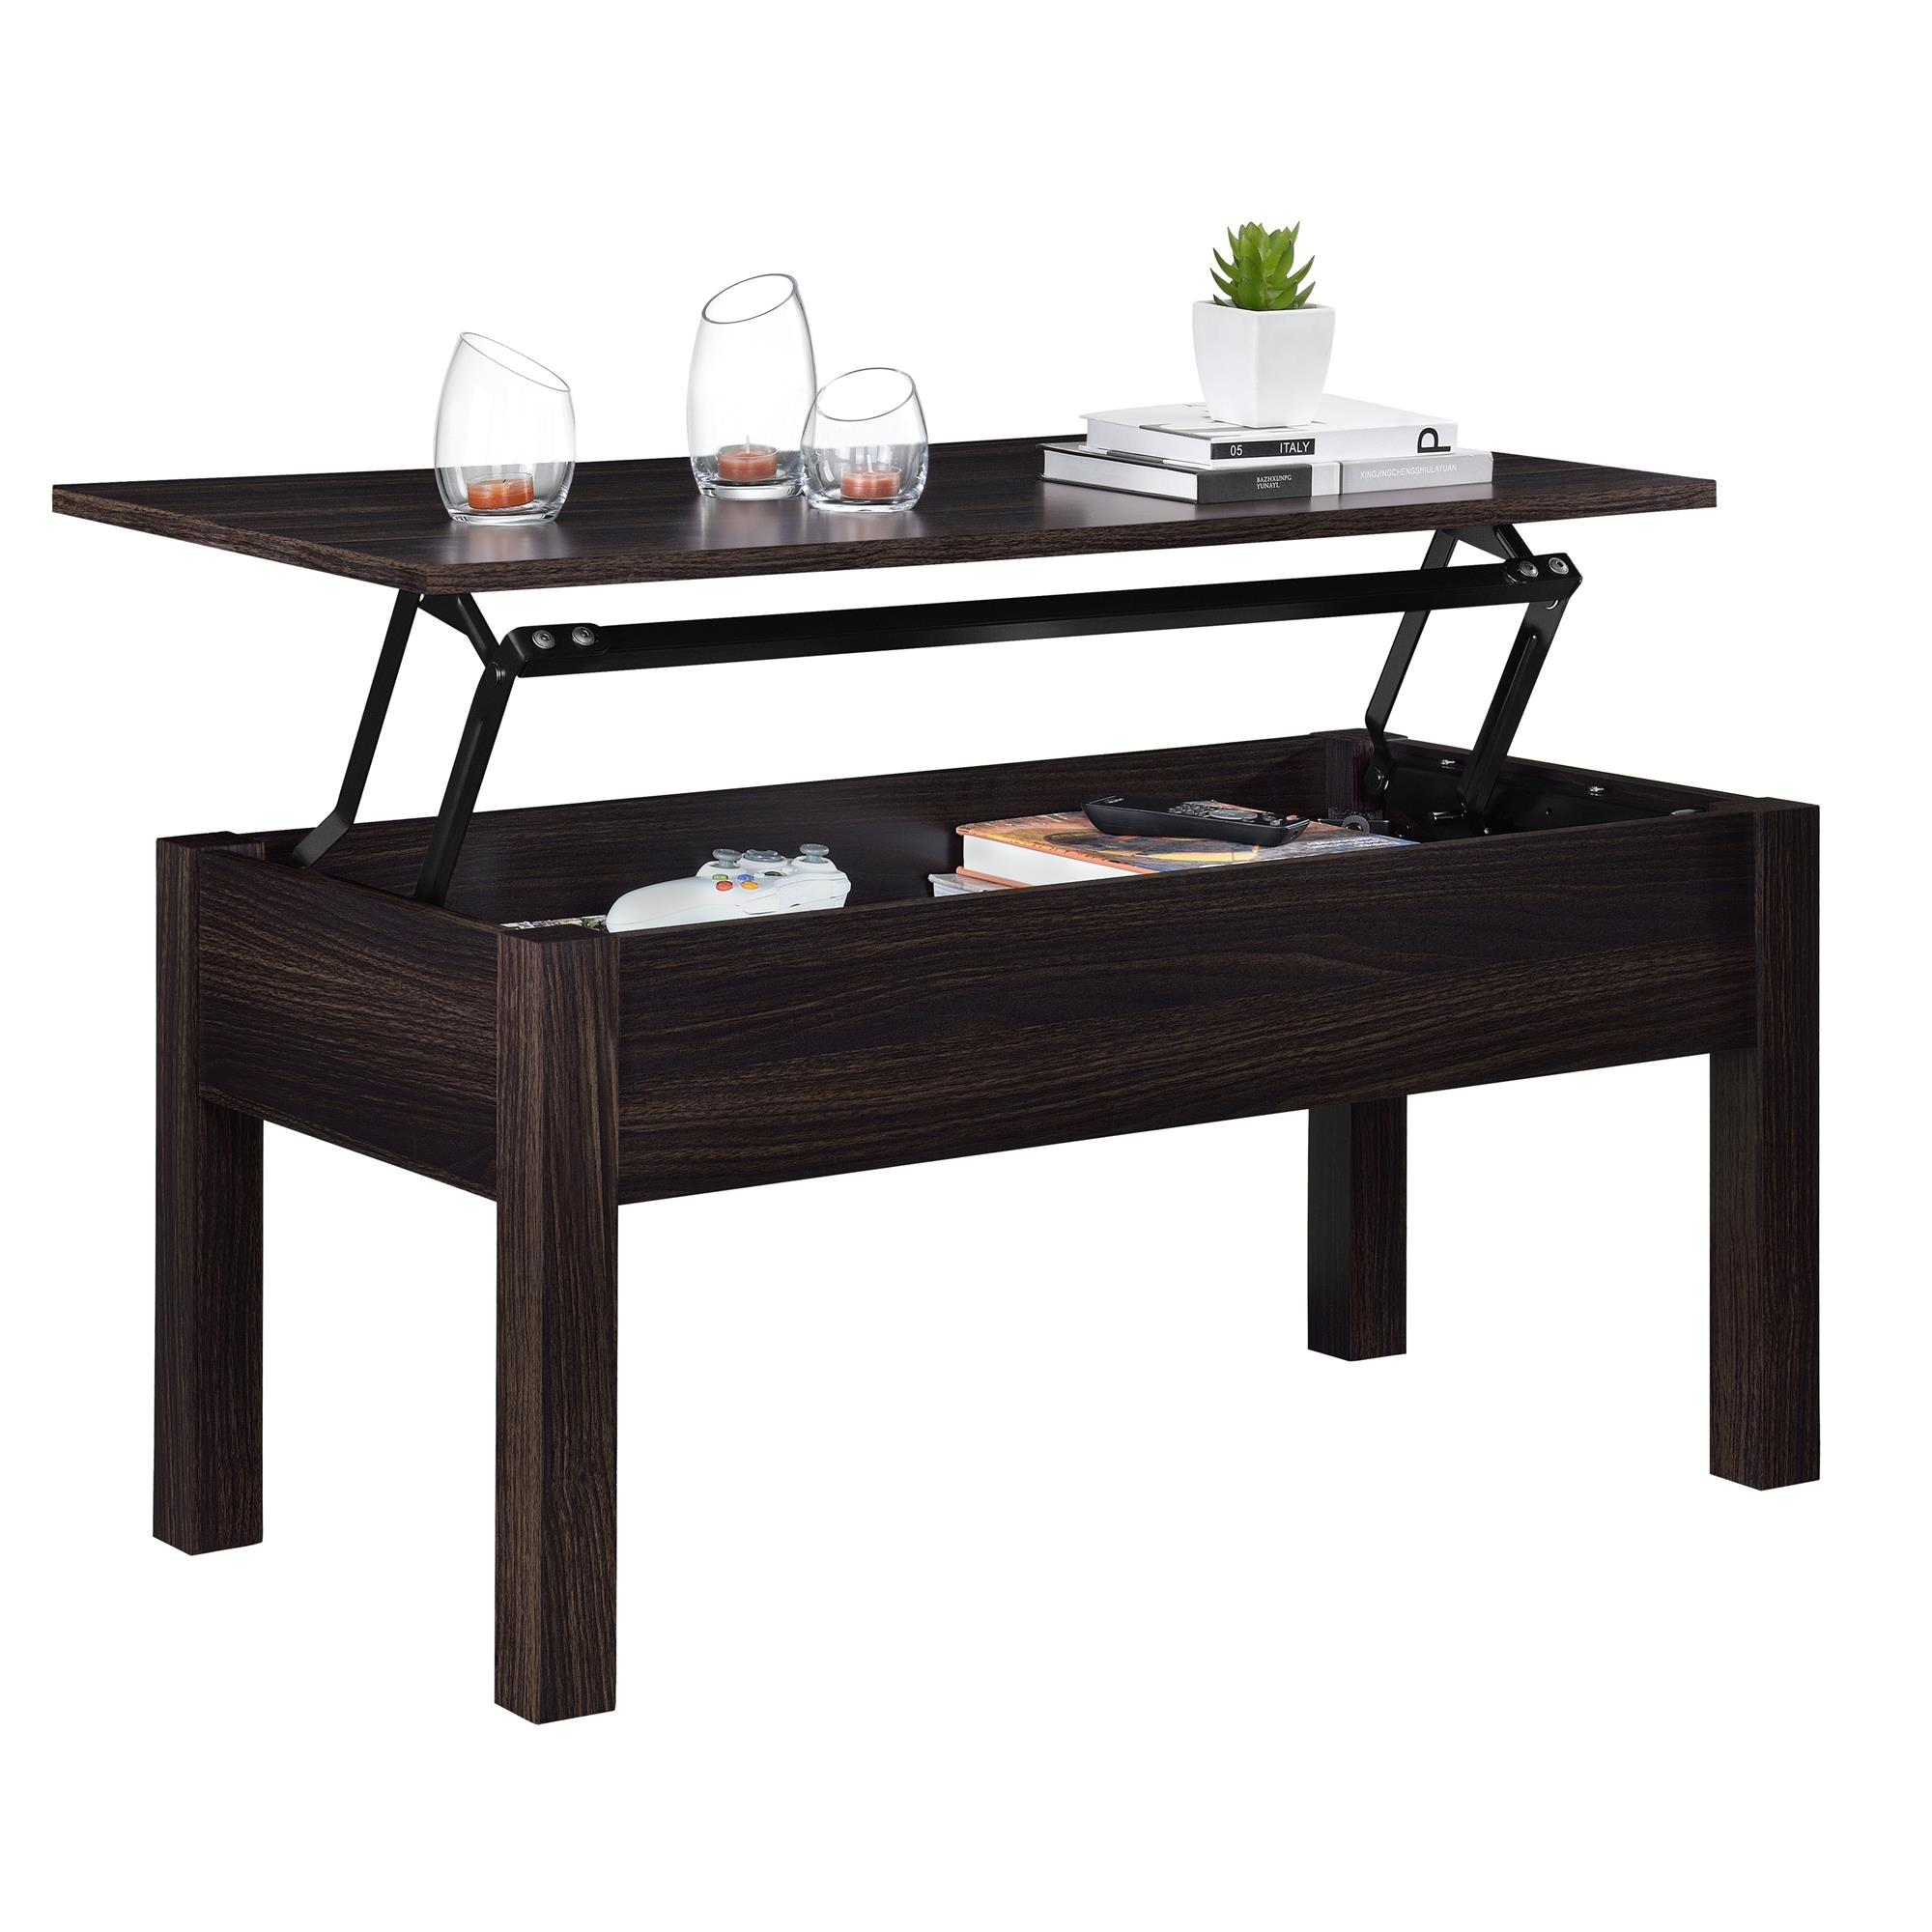 Lift top Coffee Table Ikea Awesome Coffee Table Mainstays Lift top Coffee Table Multiple Colors Walmart